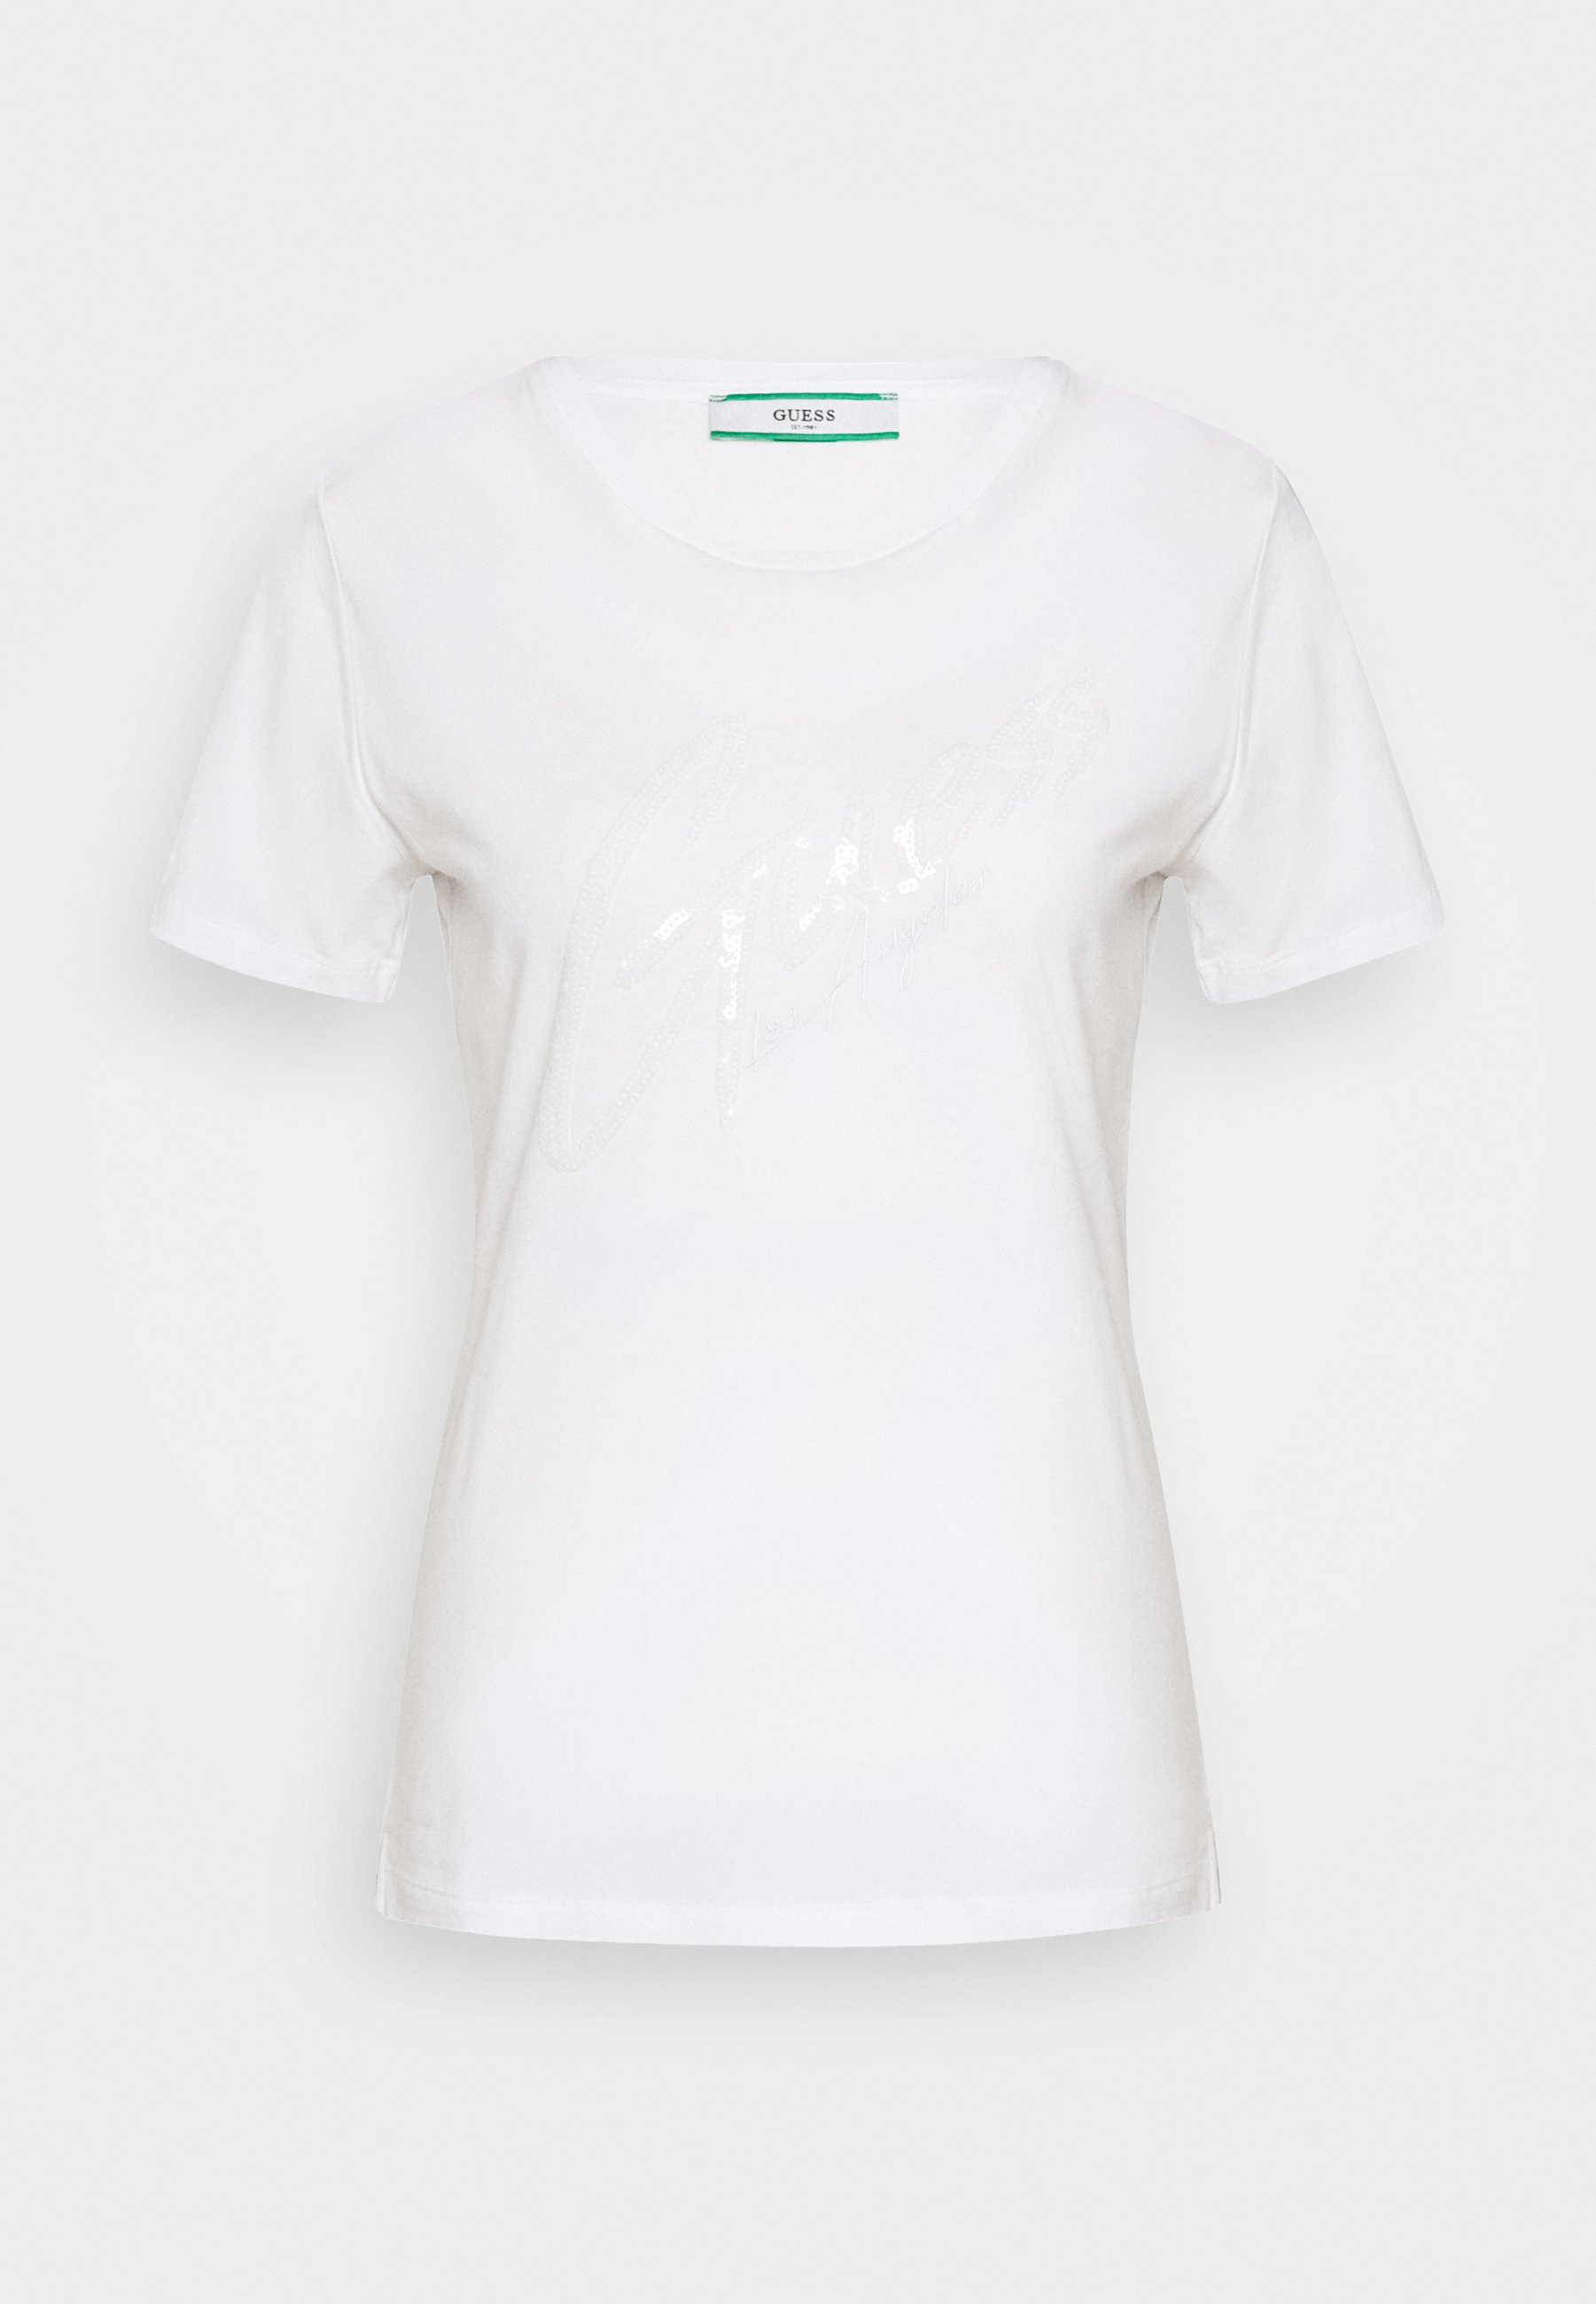 Guess Genny Tee - T-shirts Med Print True White/hvit